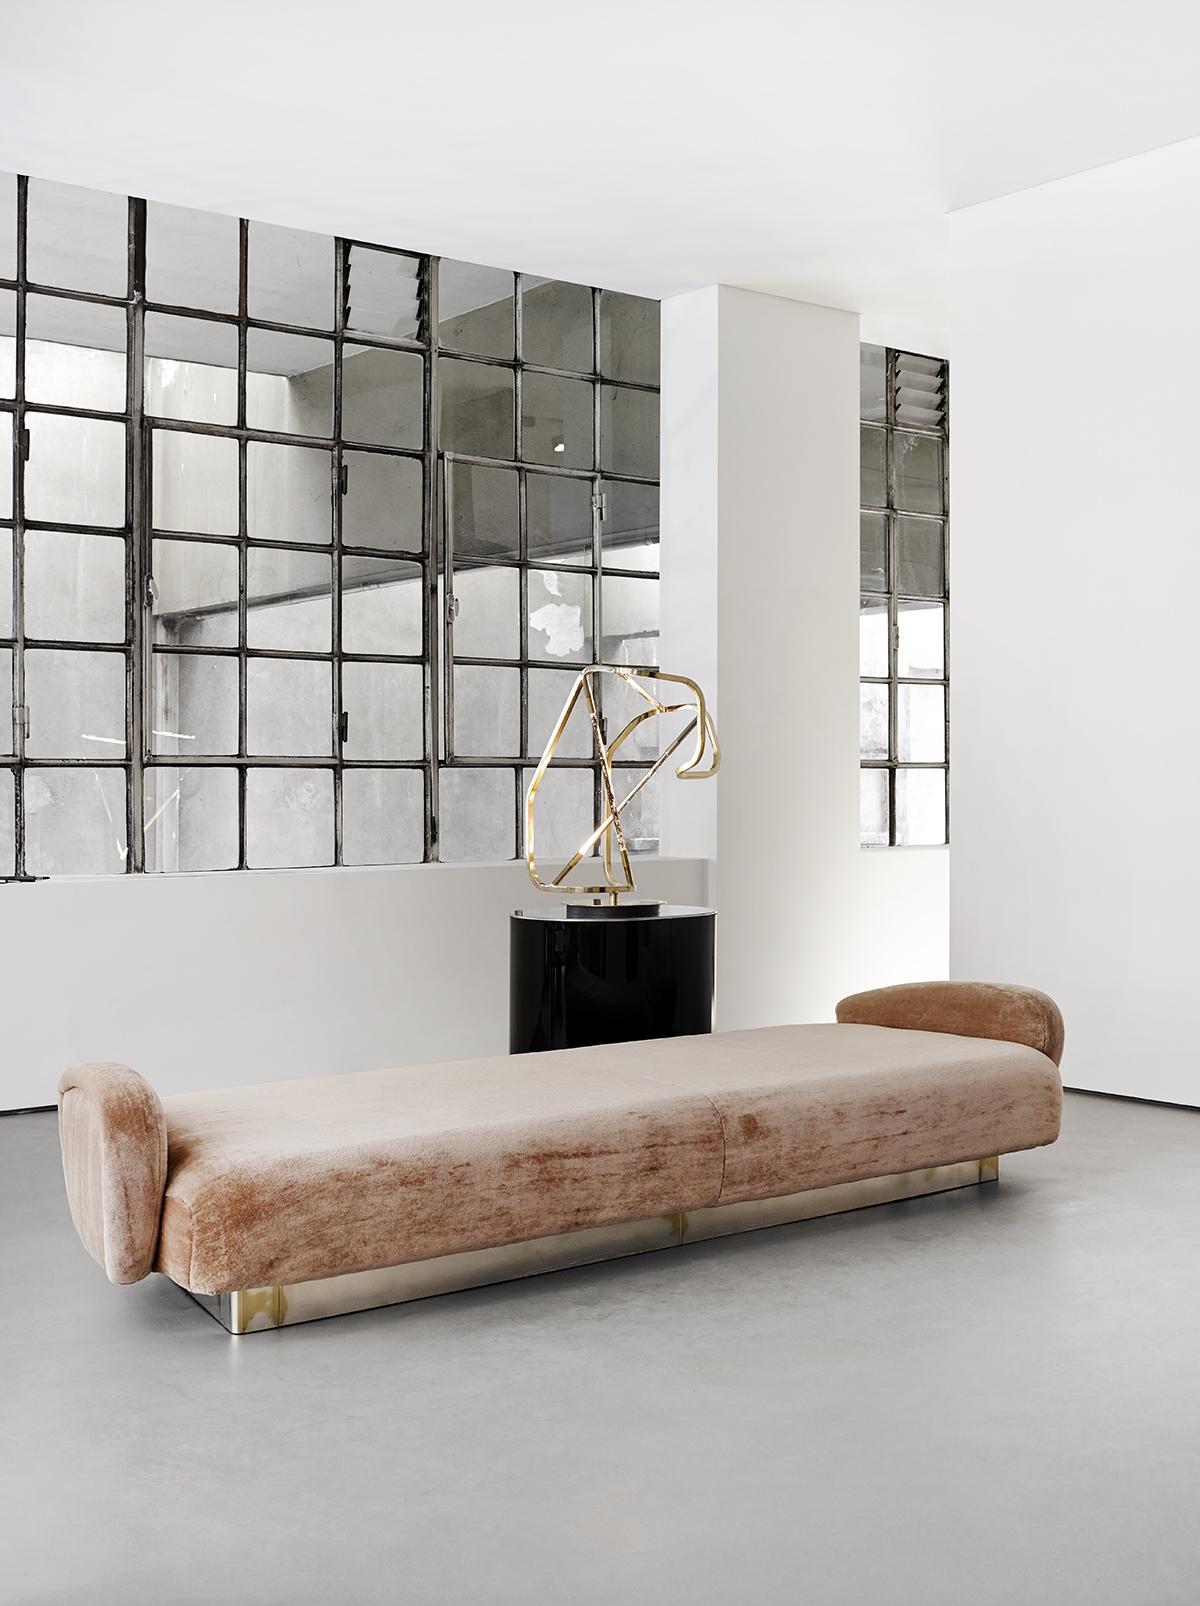 DC1604 seating sofa canapé Vicenzo de Cotiis 2016 2